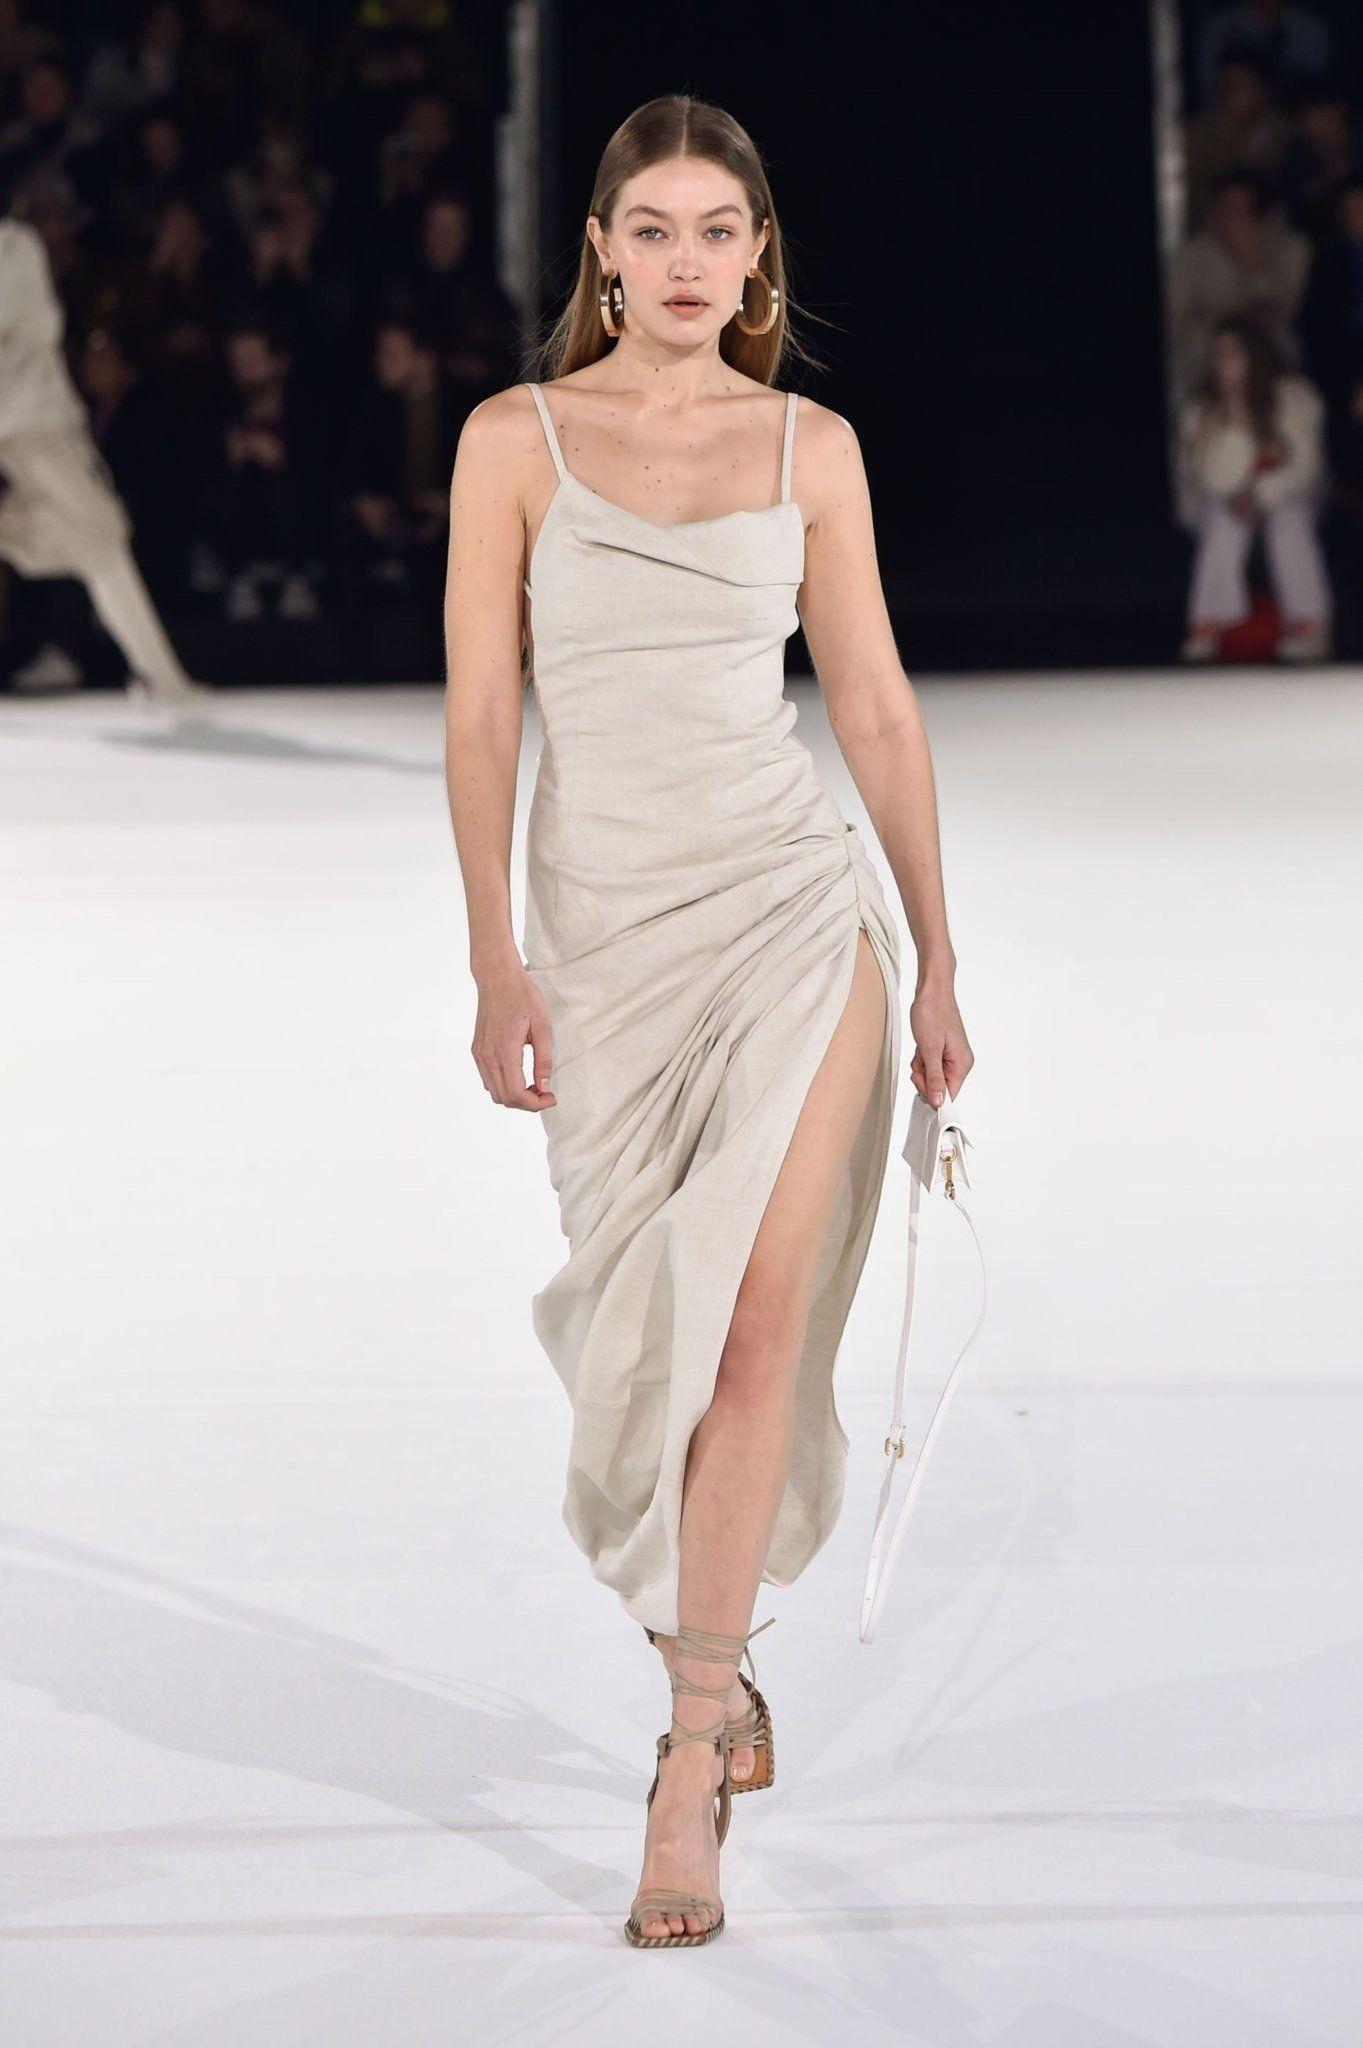 Gigi Hadid Tan Dress Google Search Fashion Week Runway Fashion Week 2020 Runway Paris Fashion Week Runway [ 2048 x 1363 Pixel ]